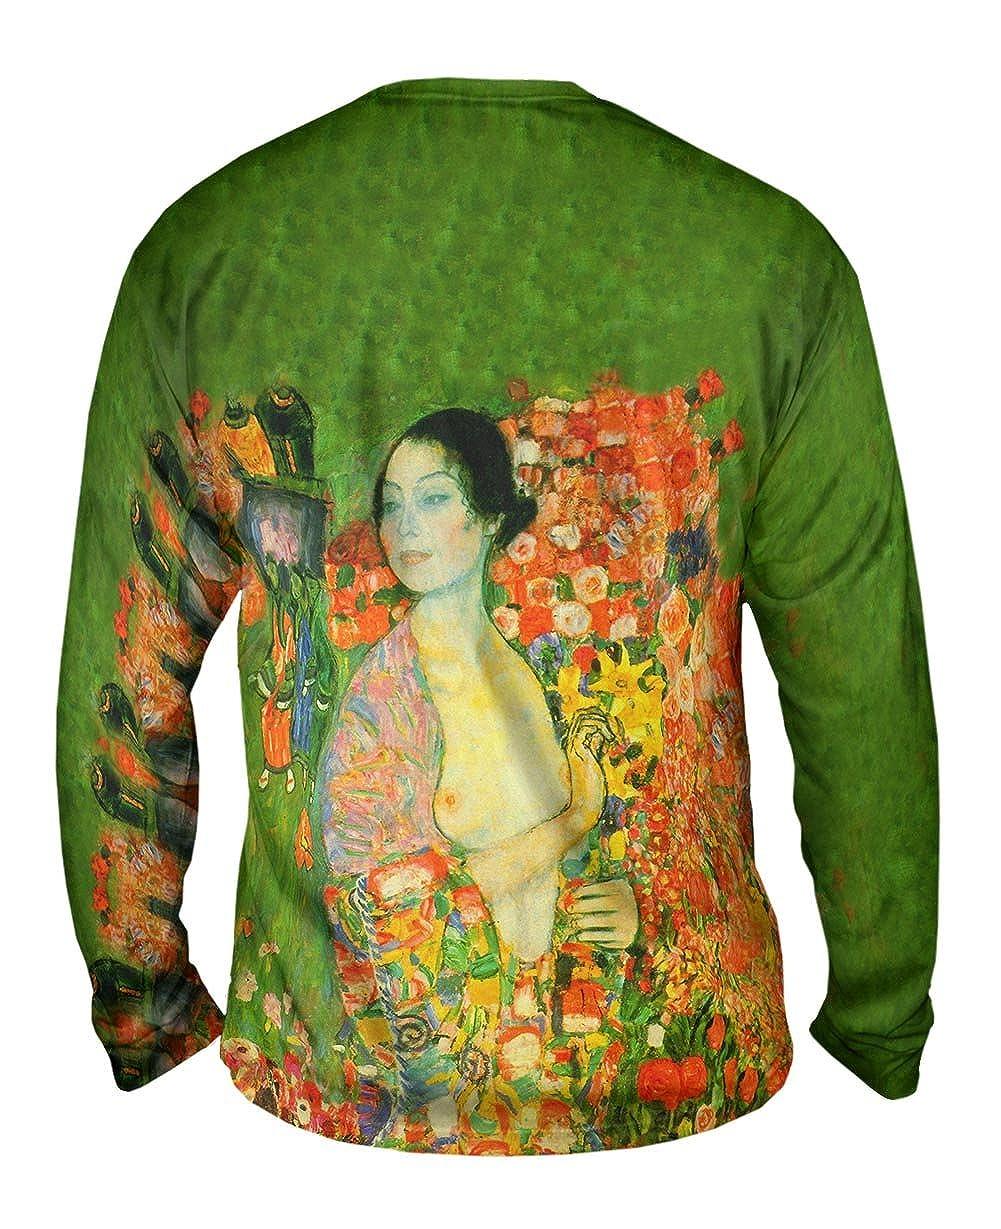 Yizzam 1918 Mens Long Sleeve Gustav Klimt The Dancer -TShirt